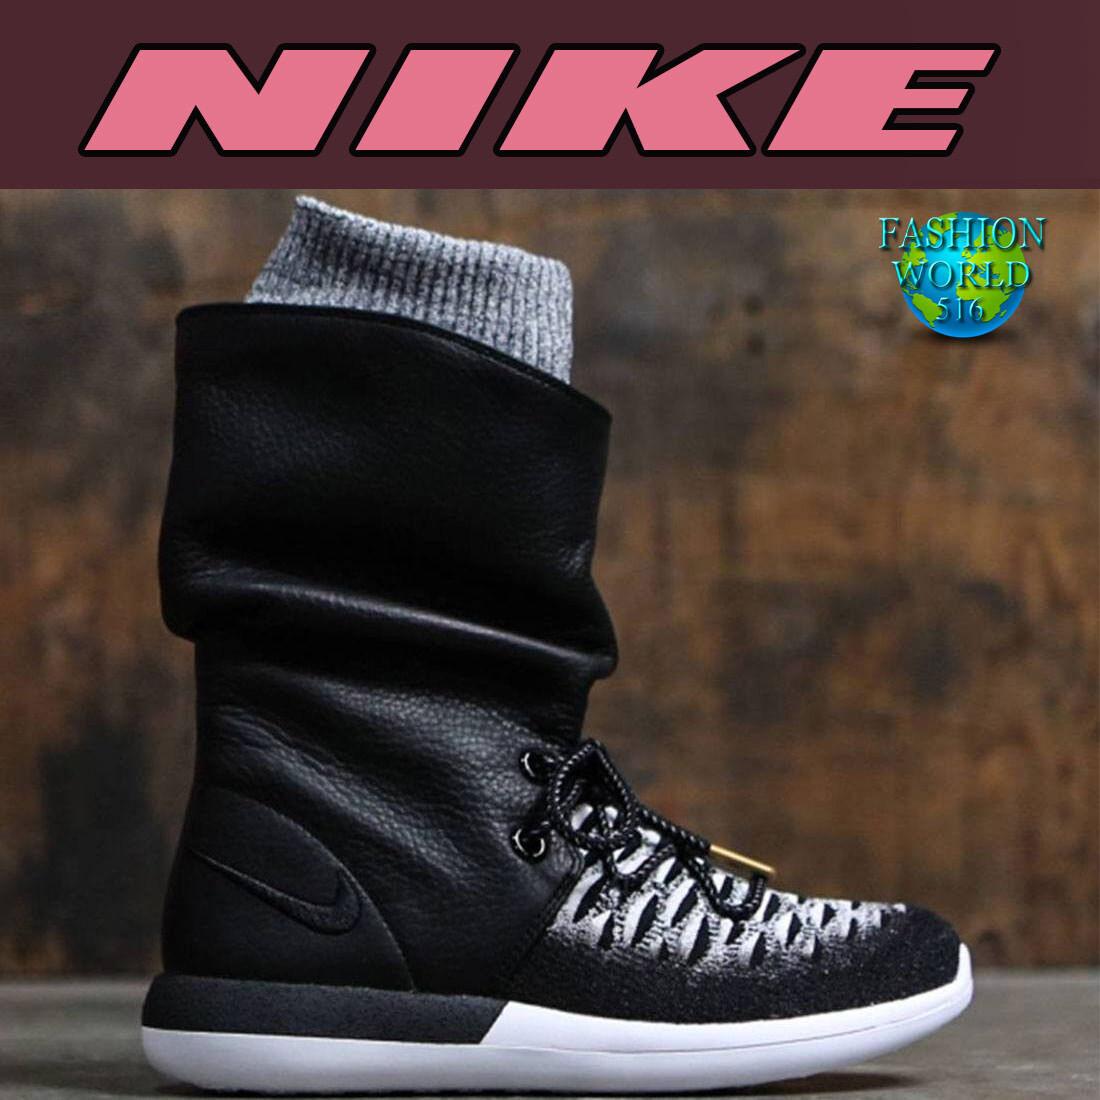 NIKE Women's 861708 Size 6.5 Roshe Two Flyknit Hi Boots 861708 Women's   Black/White 2a3c3d